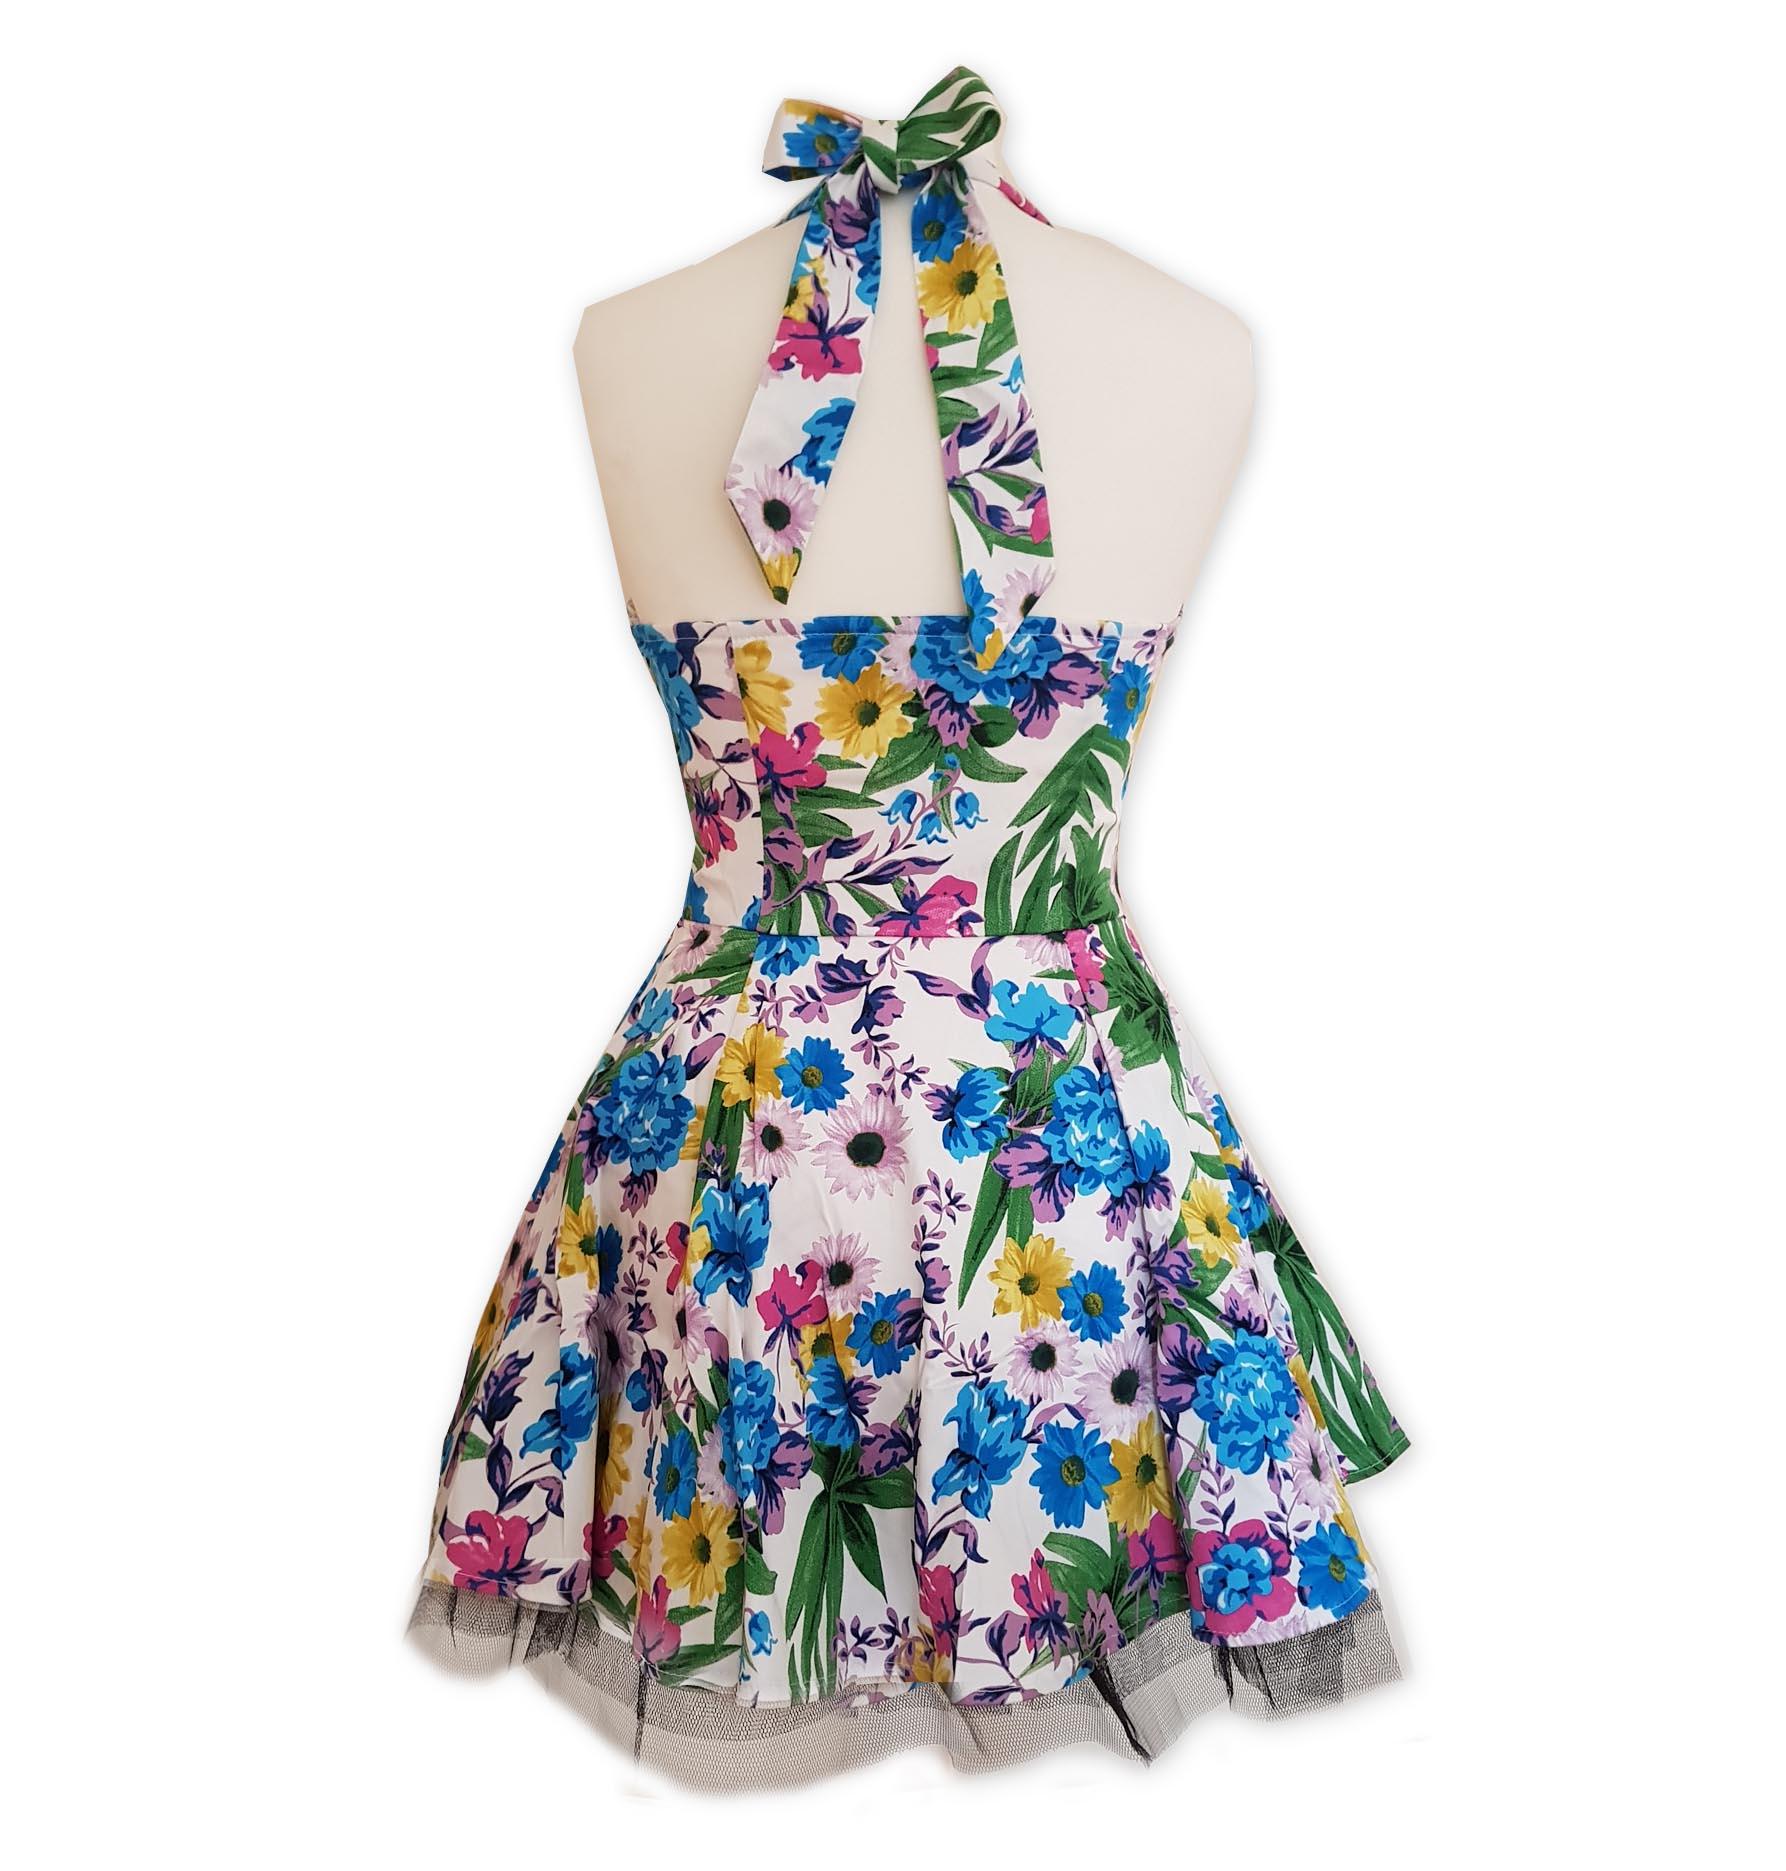 H-amp-R-Hearts-amp-Roses-London-White-Mini-Dress-039-Summer-Day-039-Flowers-All-Sizes thumbnail 9